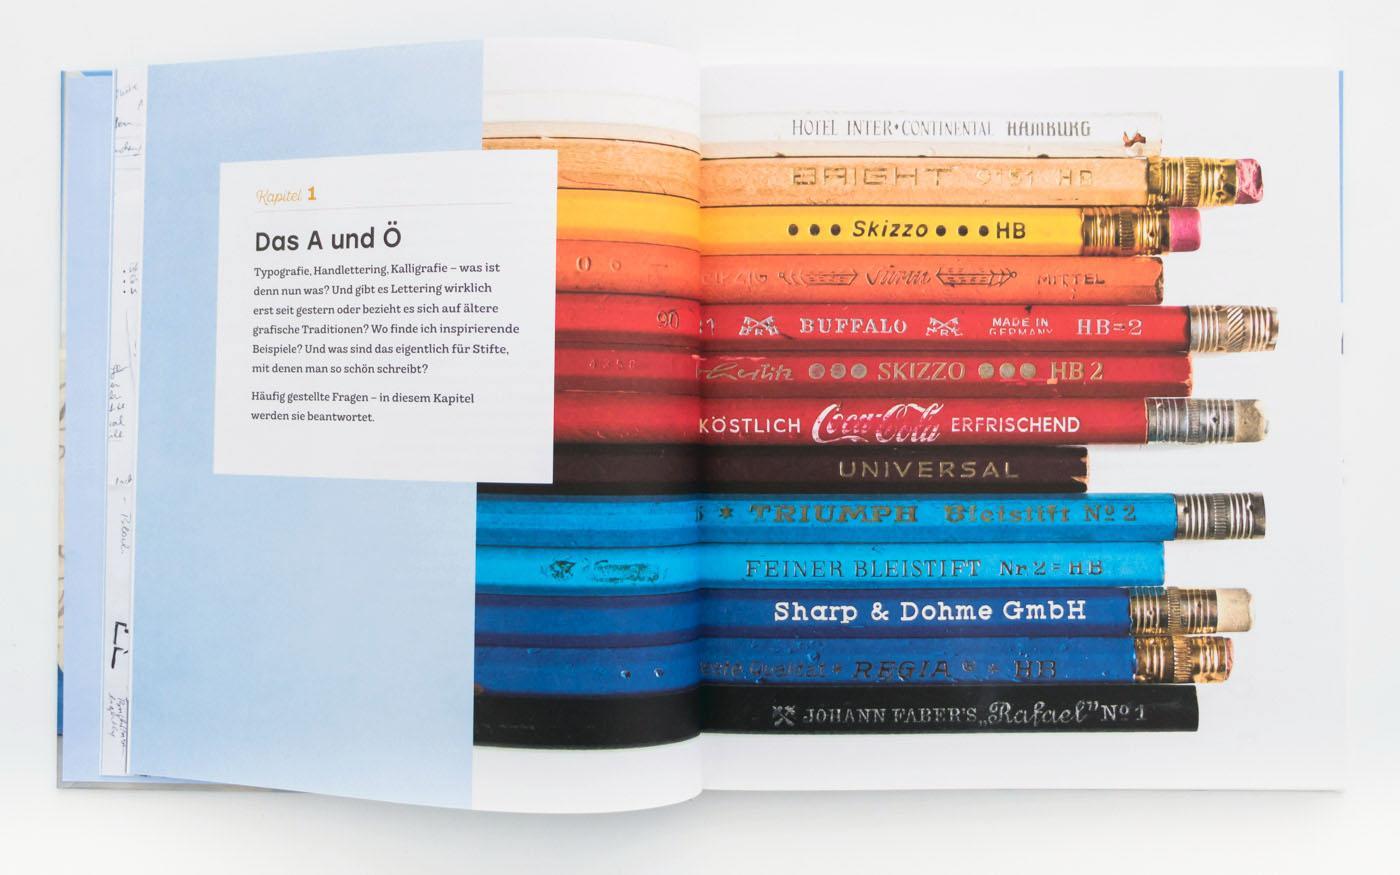 Campe_Handbuch-Handlettering_978-3-258-60165-6_-8.jpg